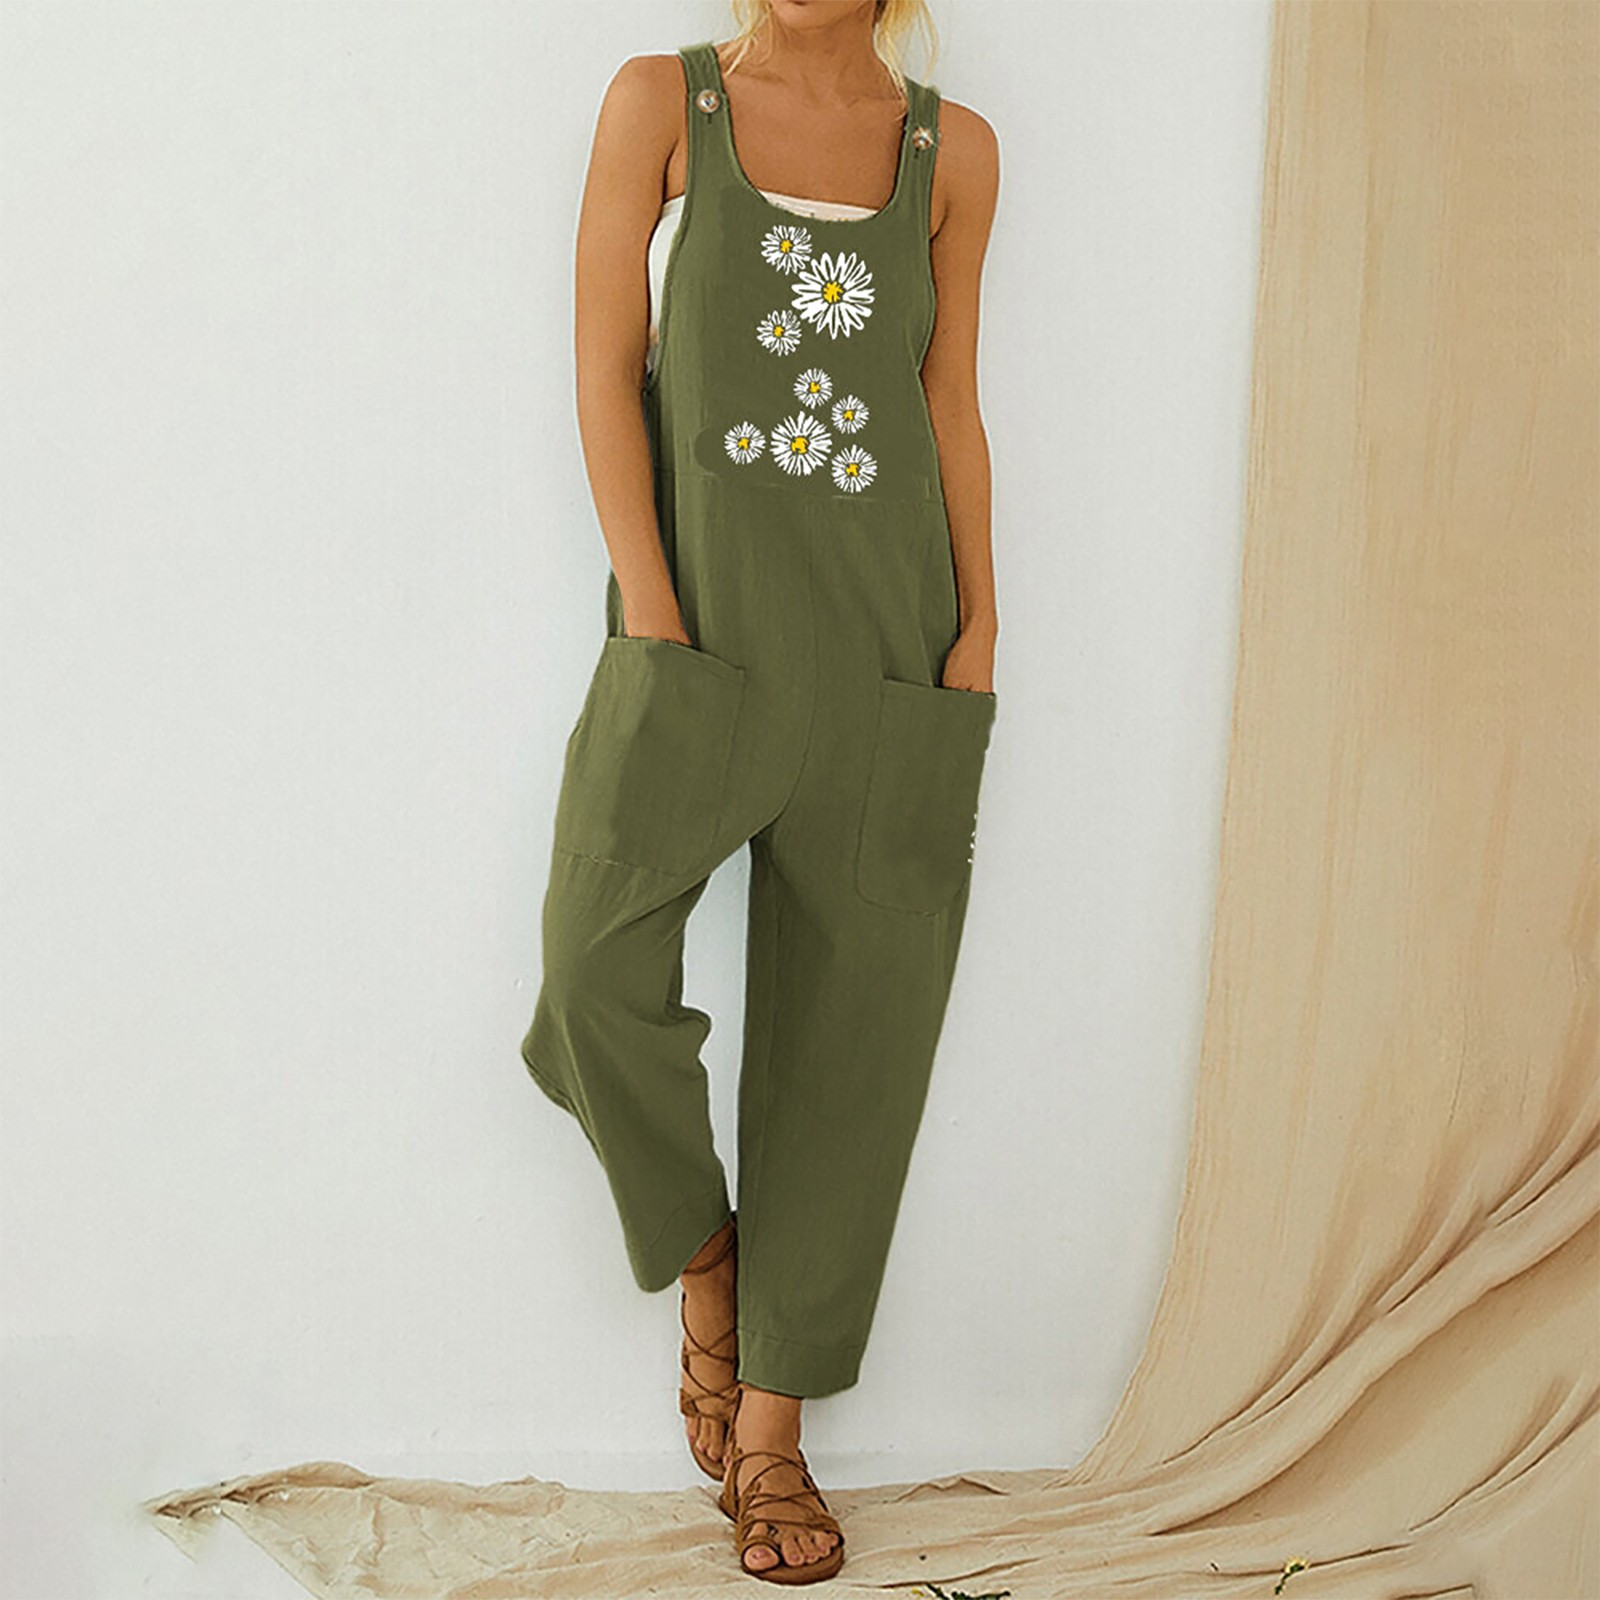 Fashion Overalls Jumpsuit Womens Floral Prints Straps Wide Leg with Pockets Vintage Summer Elegant Clothing